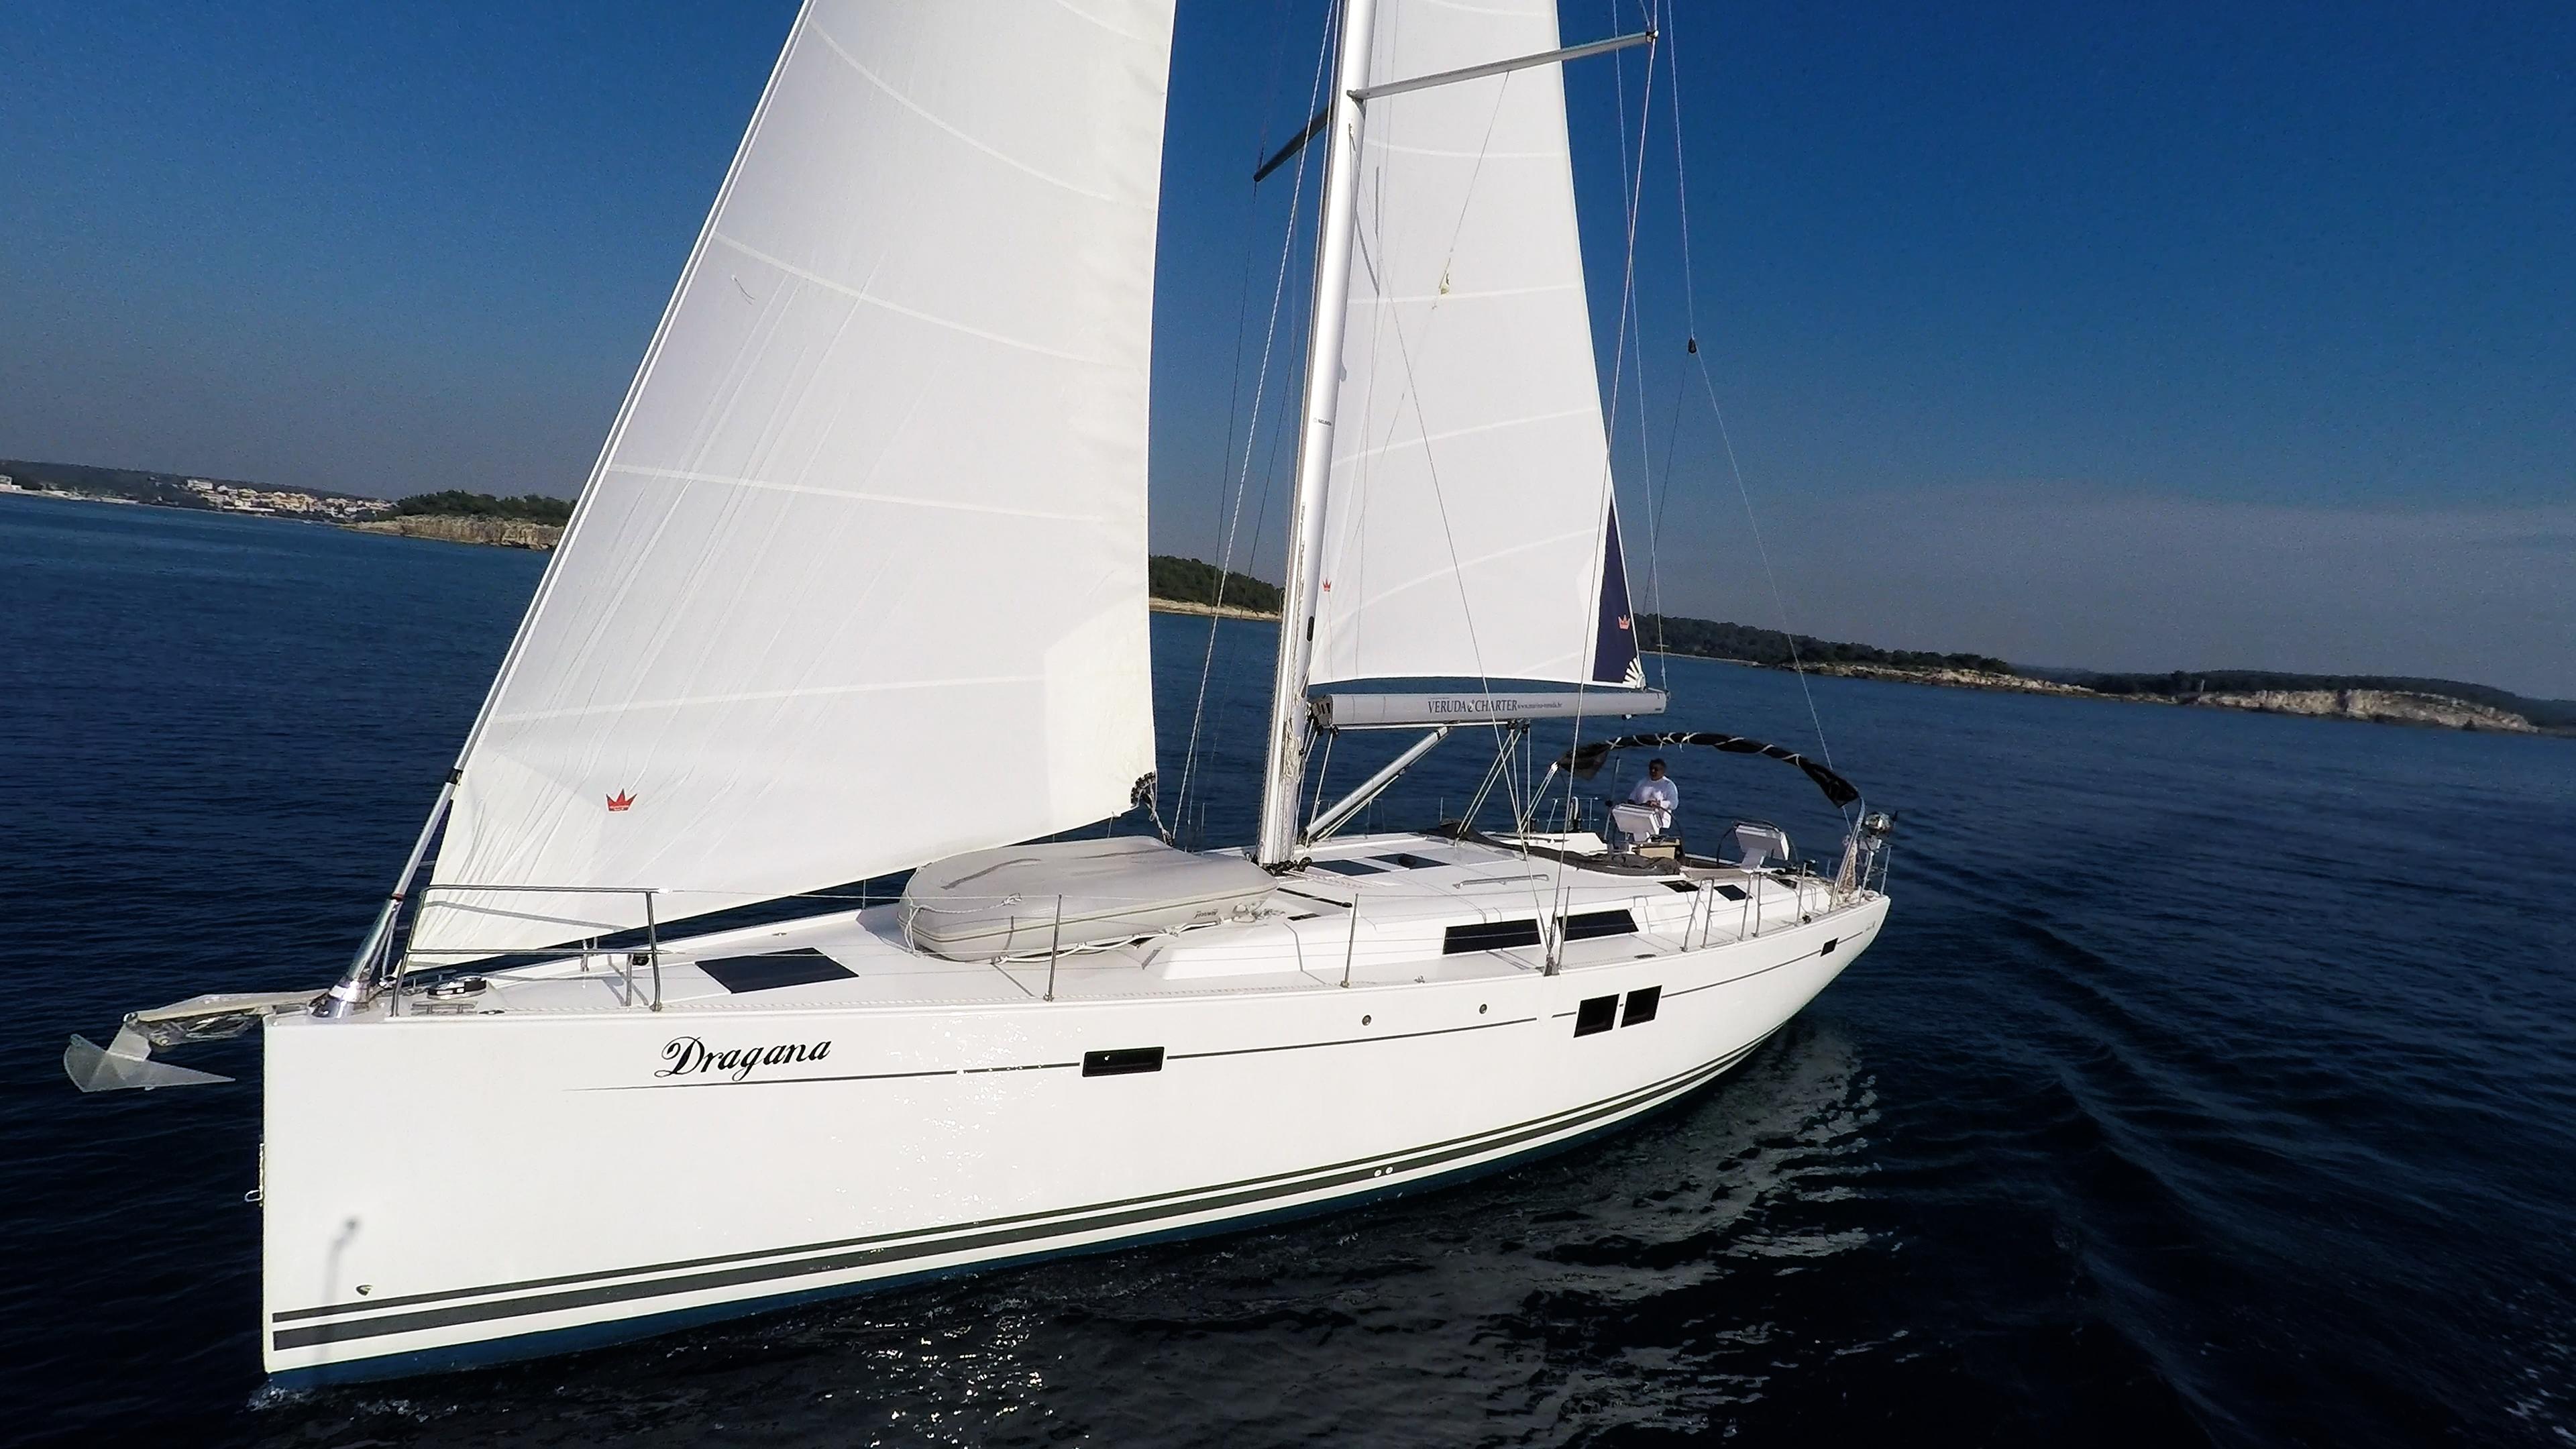 Segelyacht Bug Segelboot Hanse 505 Segeln Segel blauer Himmel Meer